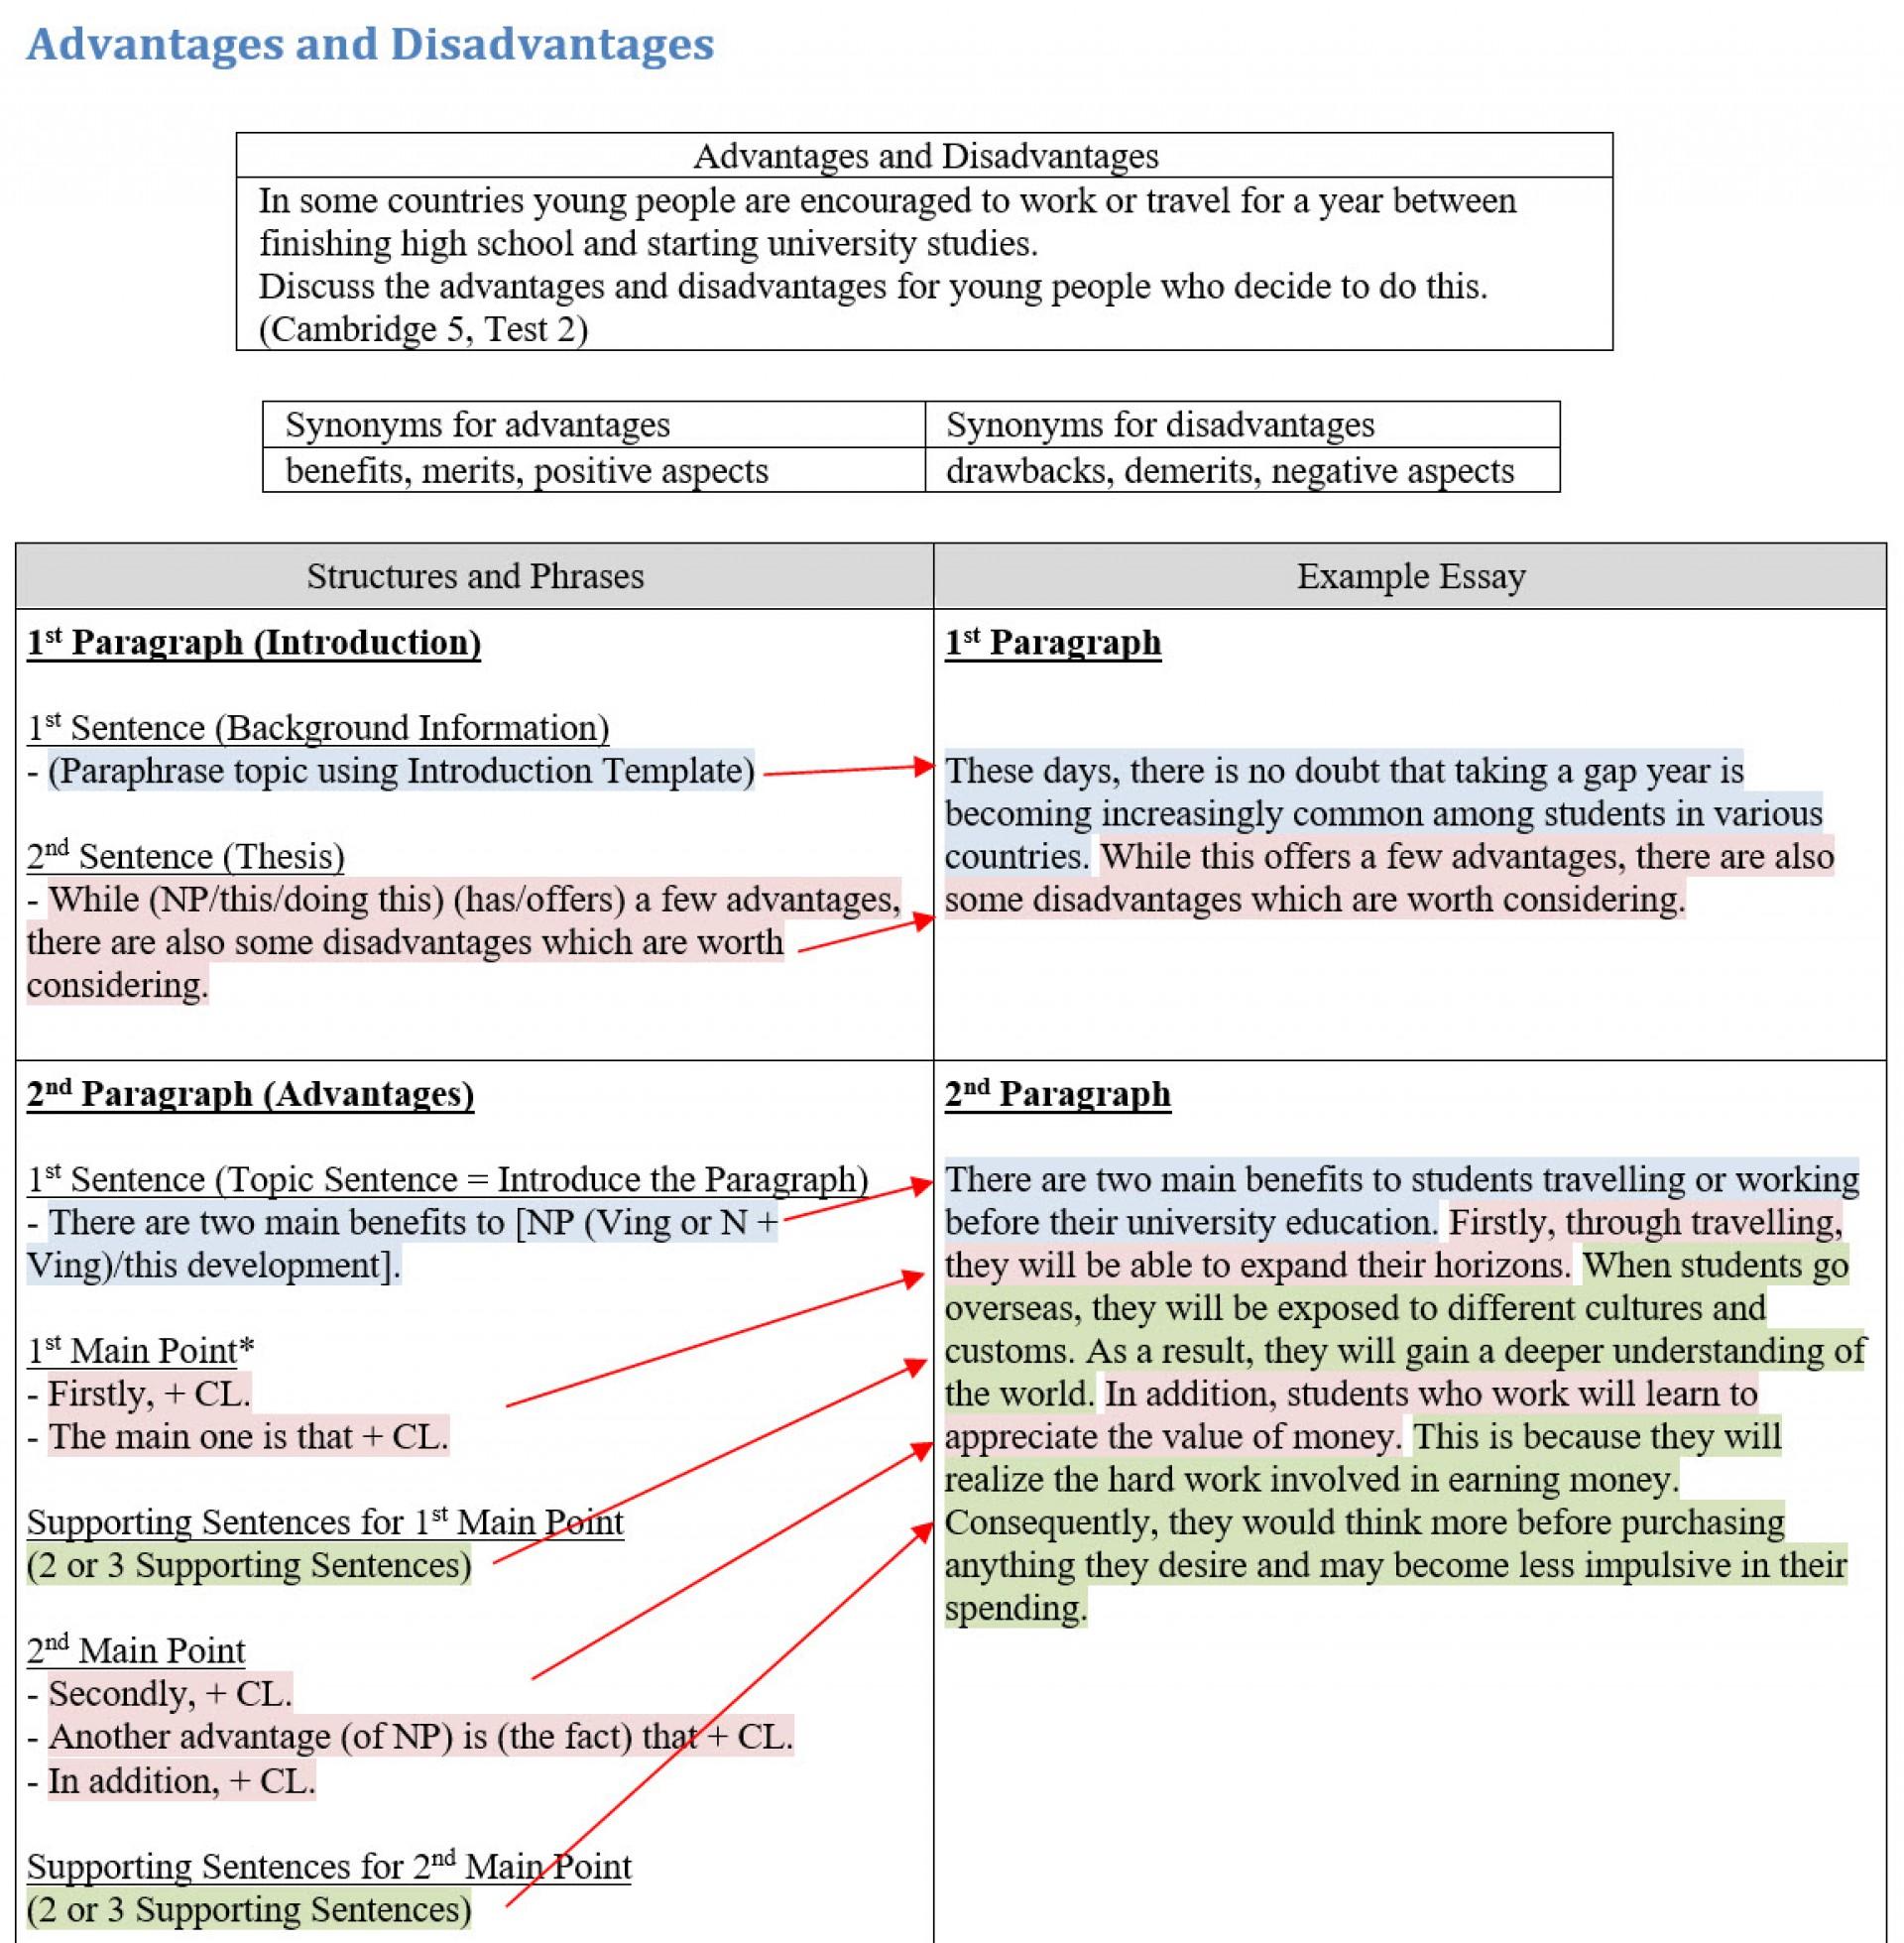 011 Paraphrase Essay Example Ielts University Singapore Legitimate Writing Legit Service Reddit Templa Uk Are There Any Stirring Means On Criticism Paraphrasing Topics 1920